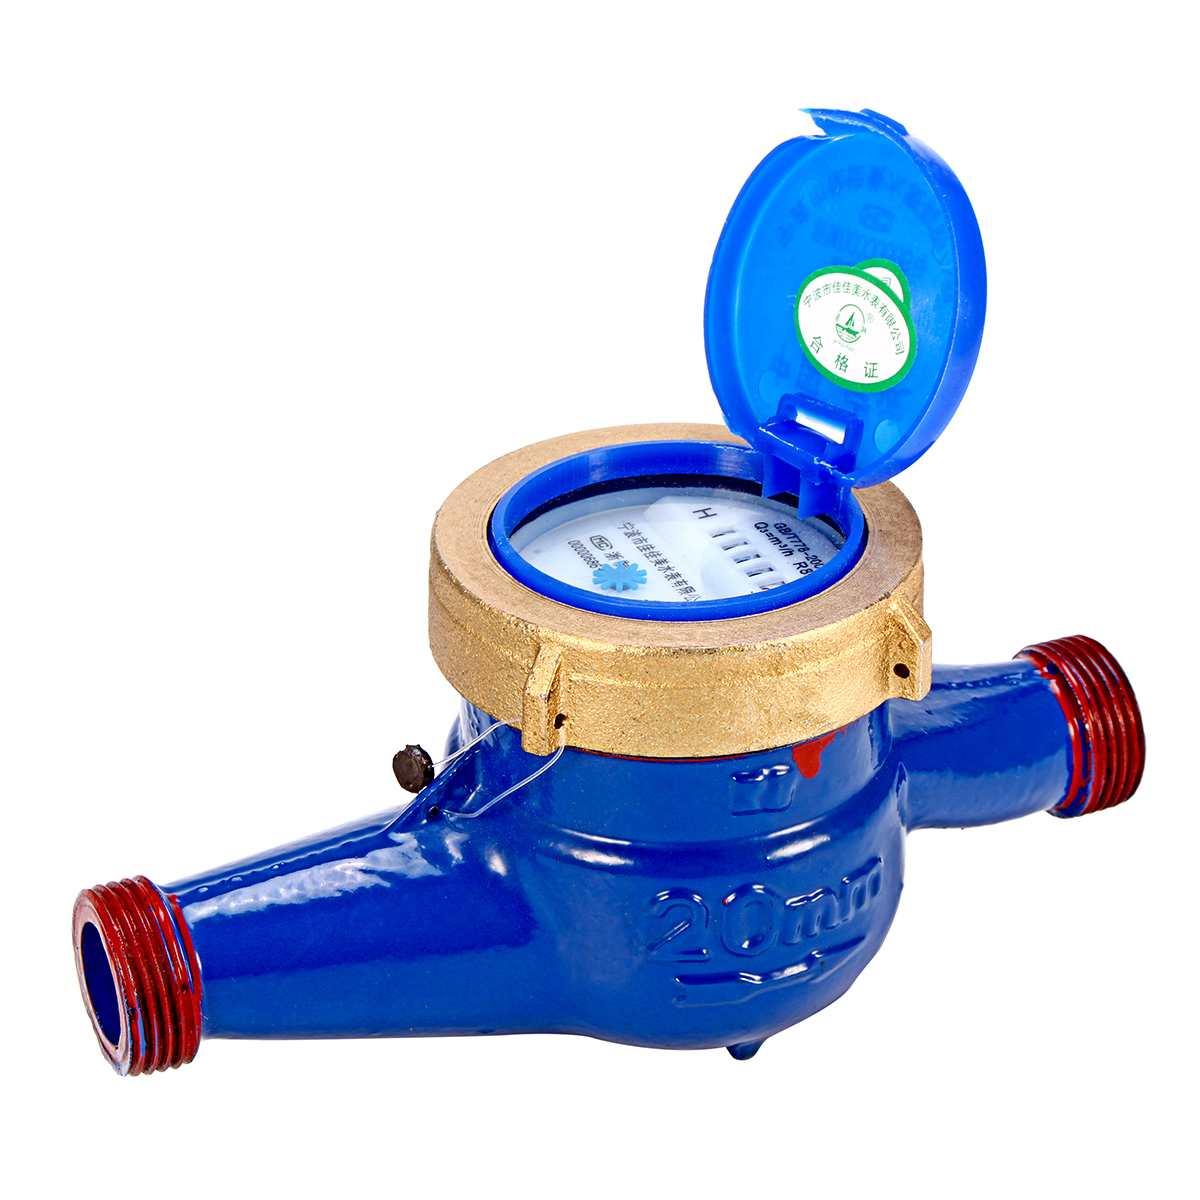 Water Meter Heavy Duty Brass Flow Measure Tap Cold Water Meter Home Garden Wet Table Measuring Tools Water Measurement 20mm